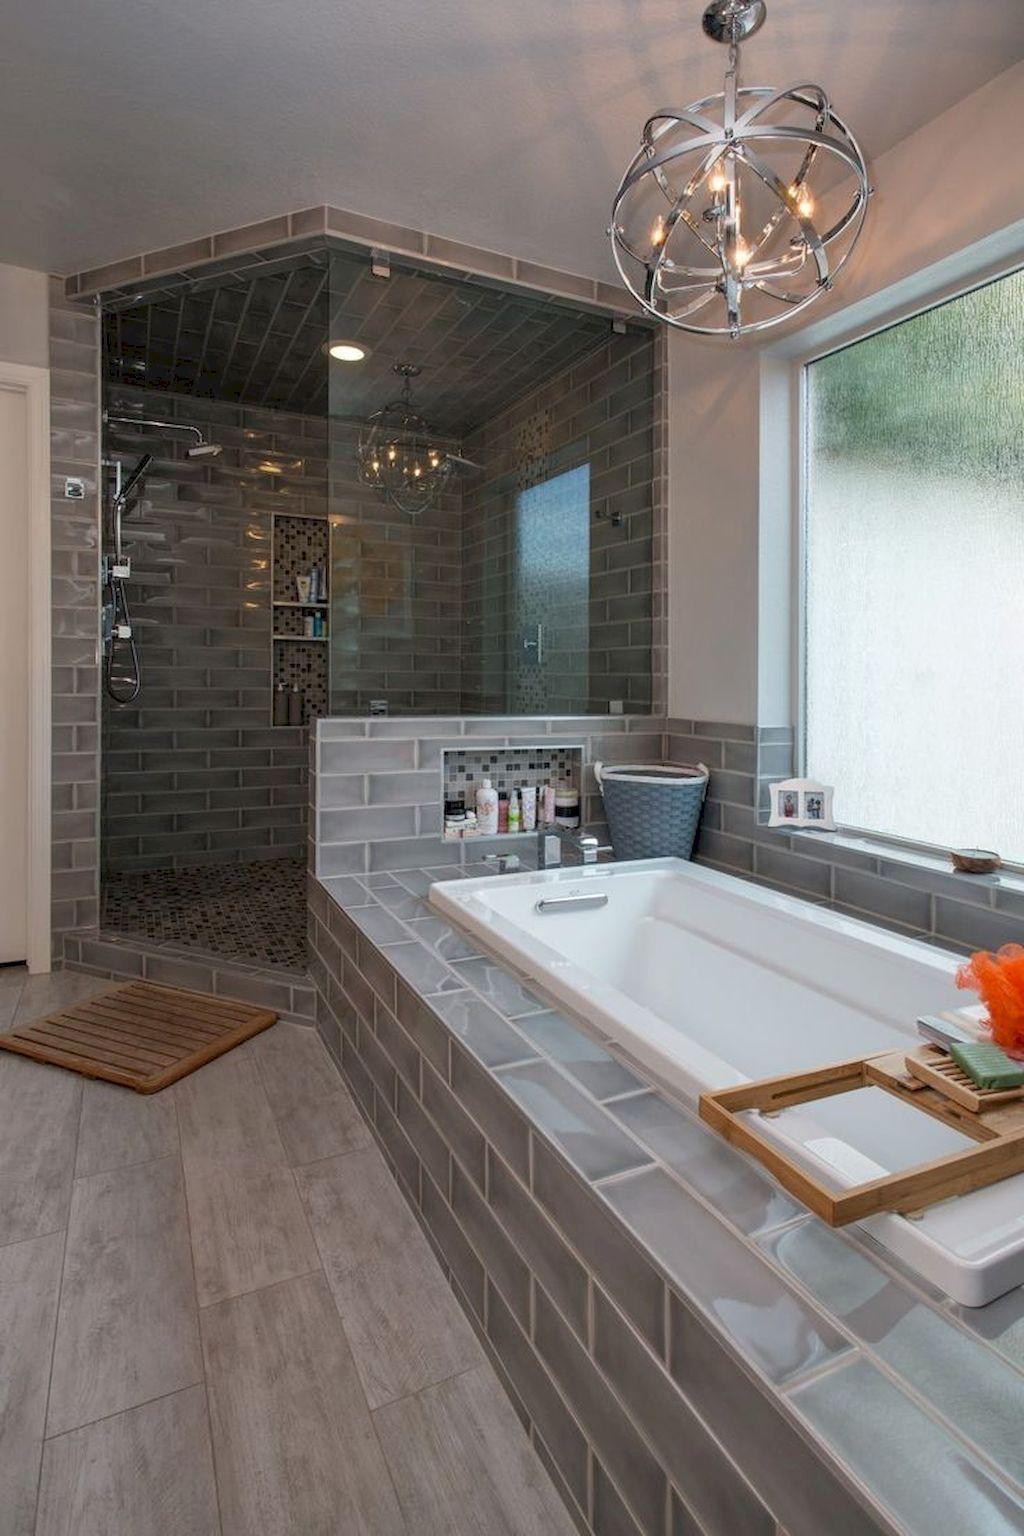 Photo of 65 Farmhouse Master Bathroom Remodel Decor Ideas #dreambathrooms The bed is basi…